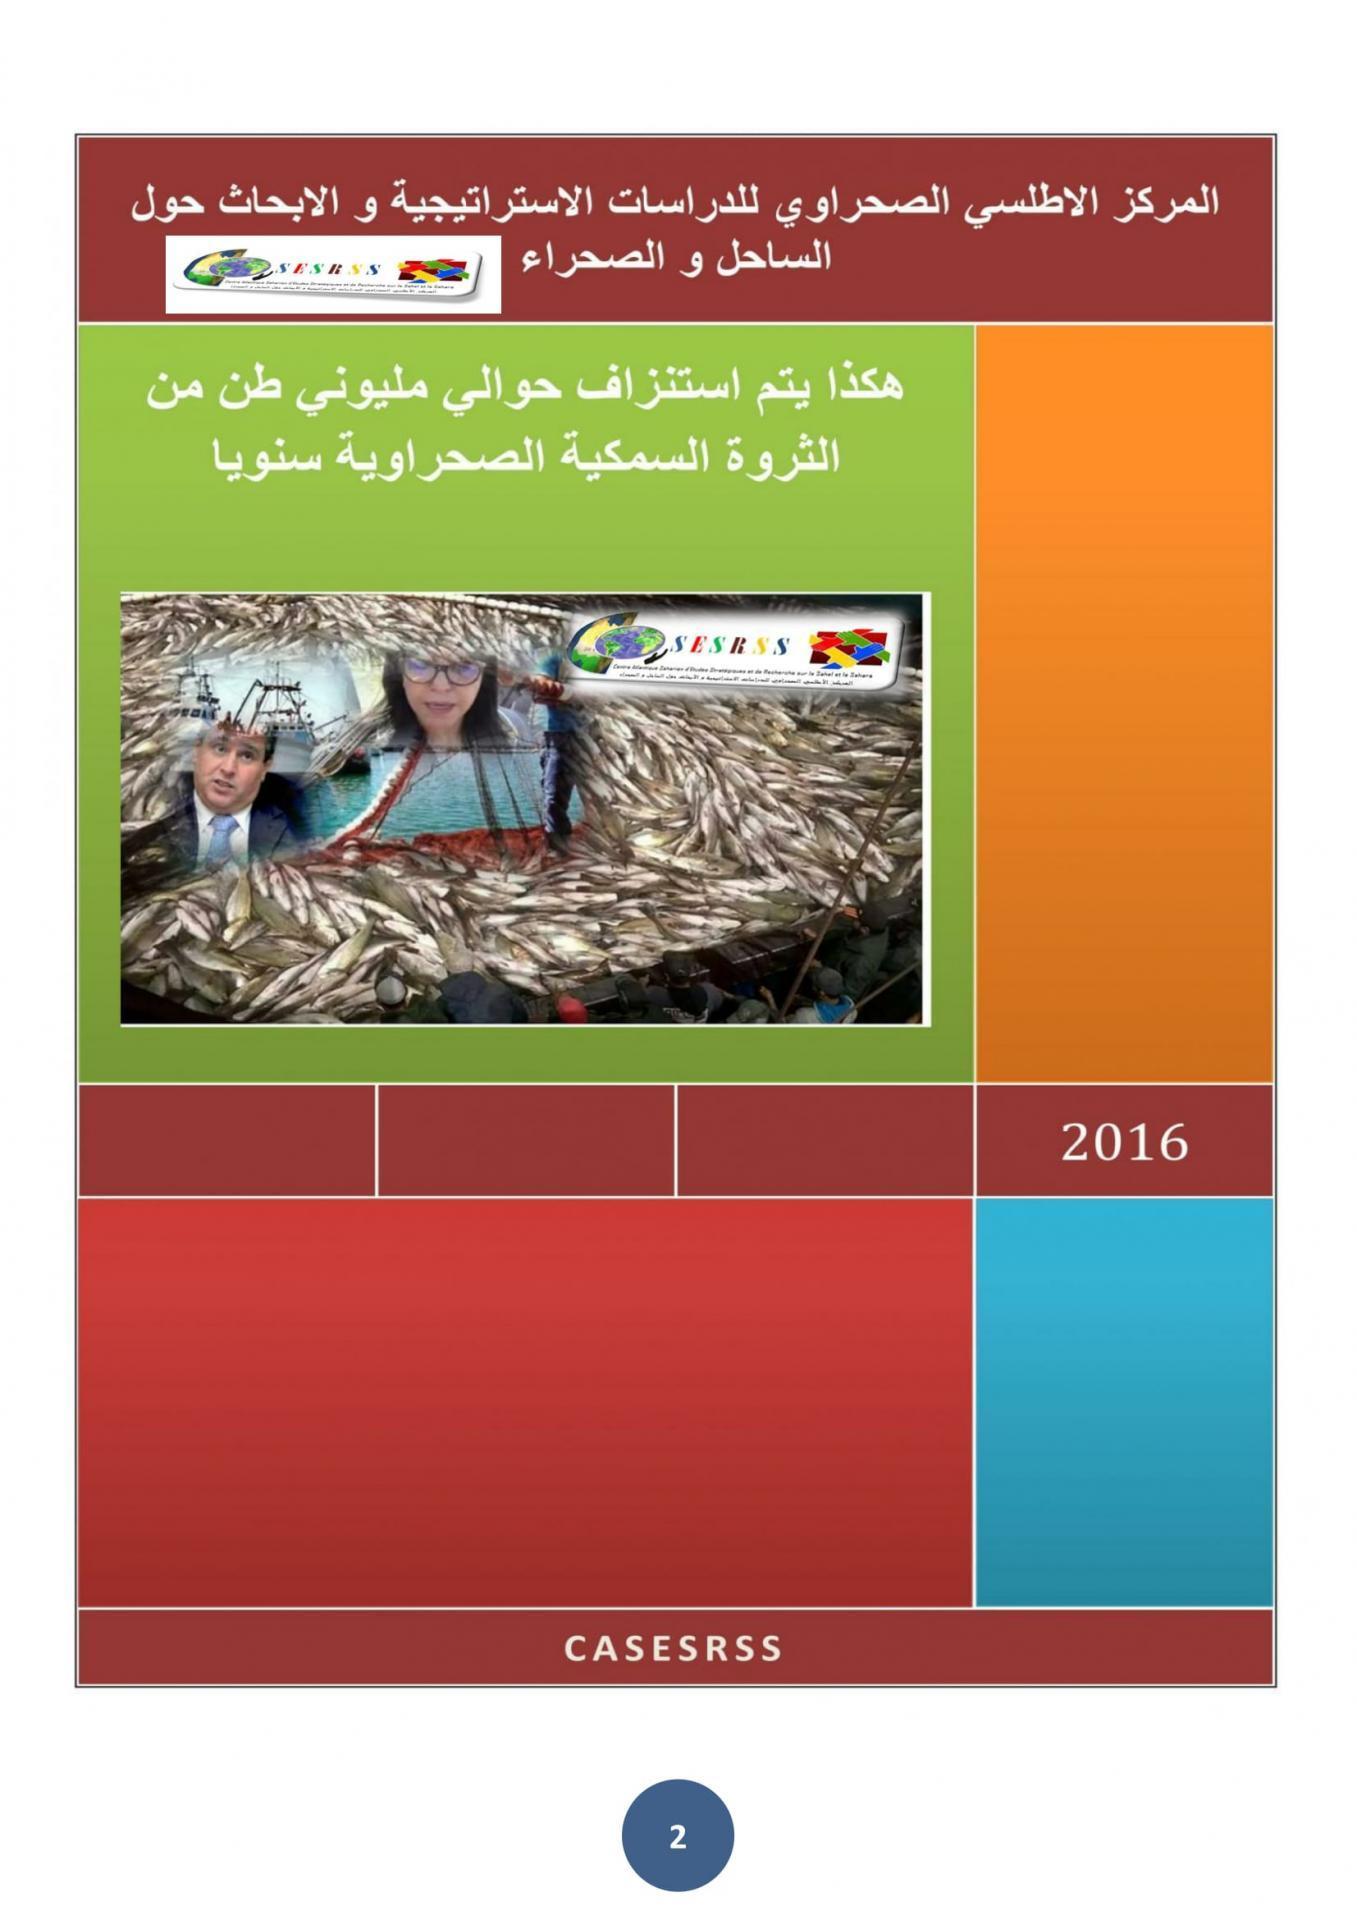 Rapport ressources 2016 3